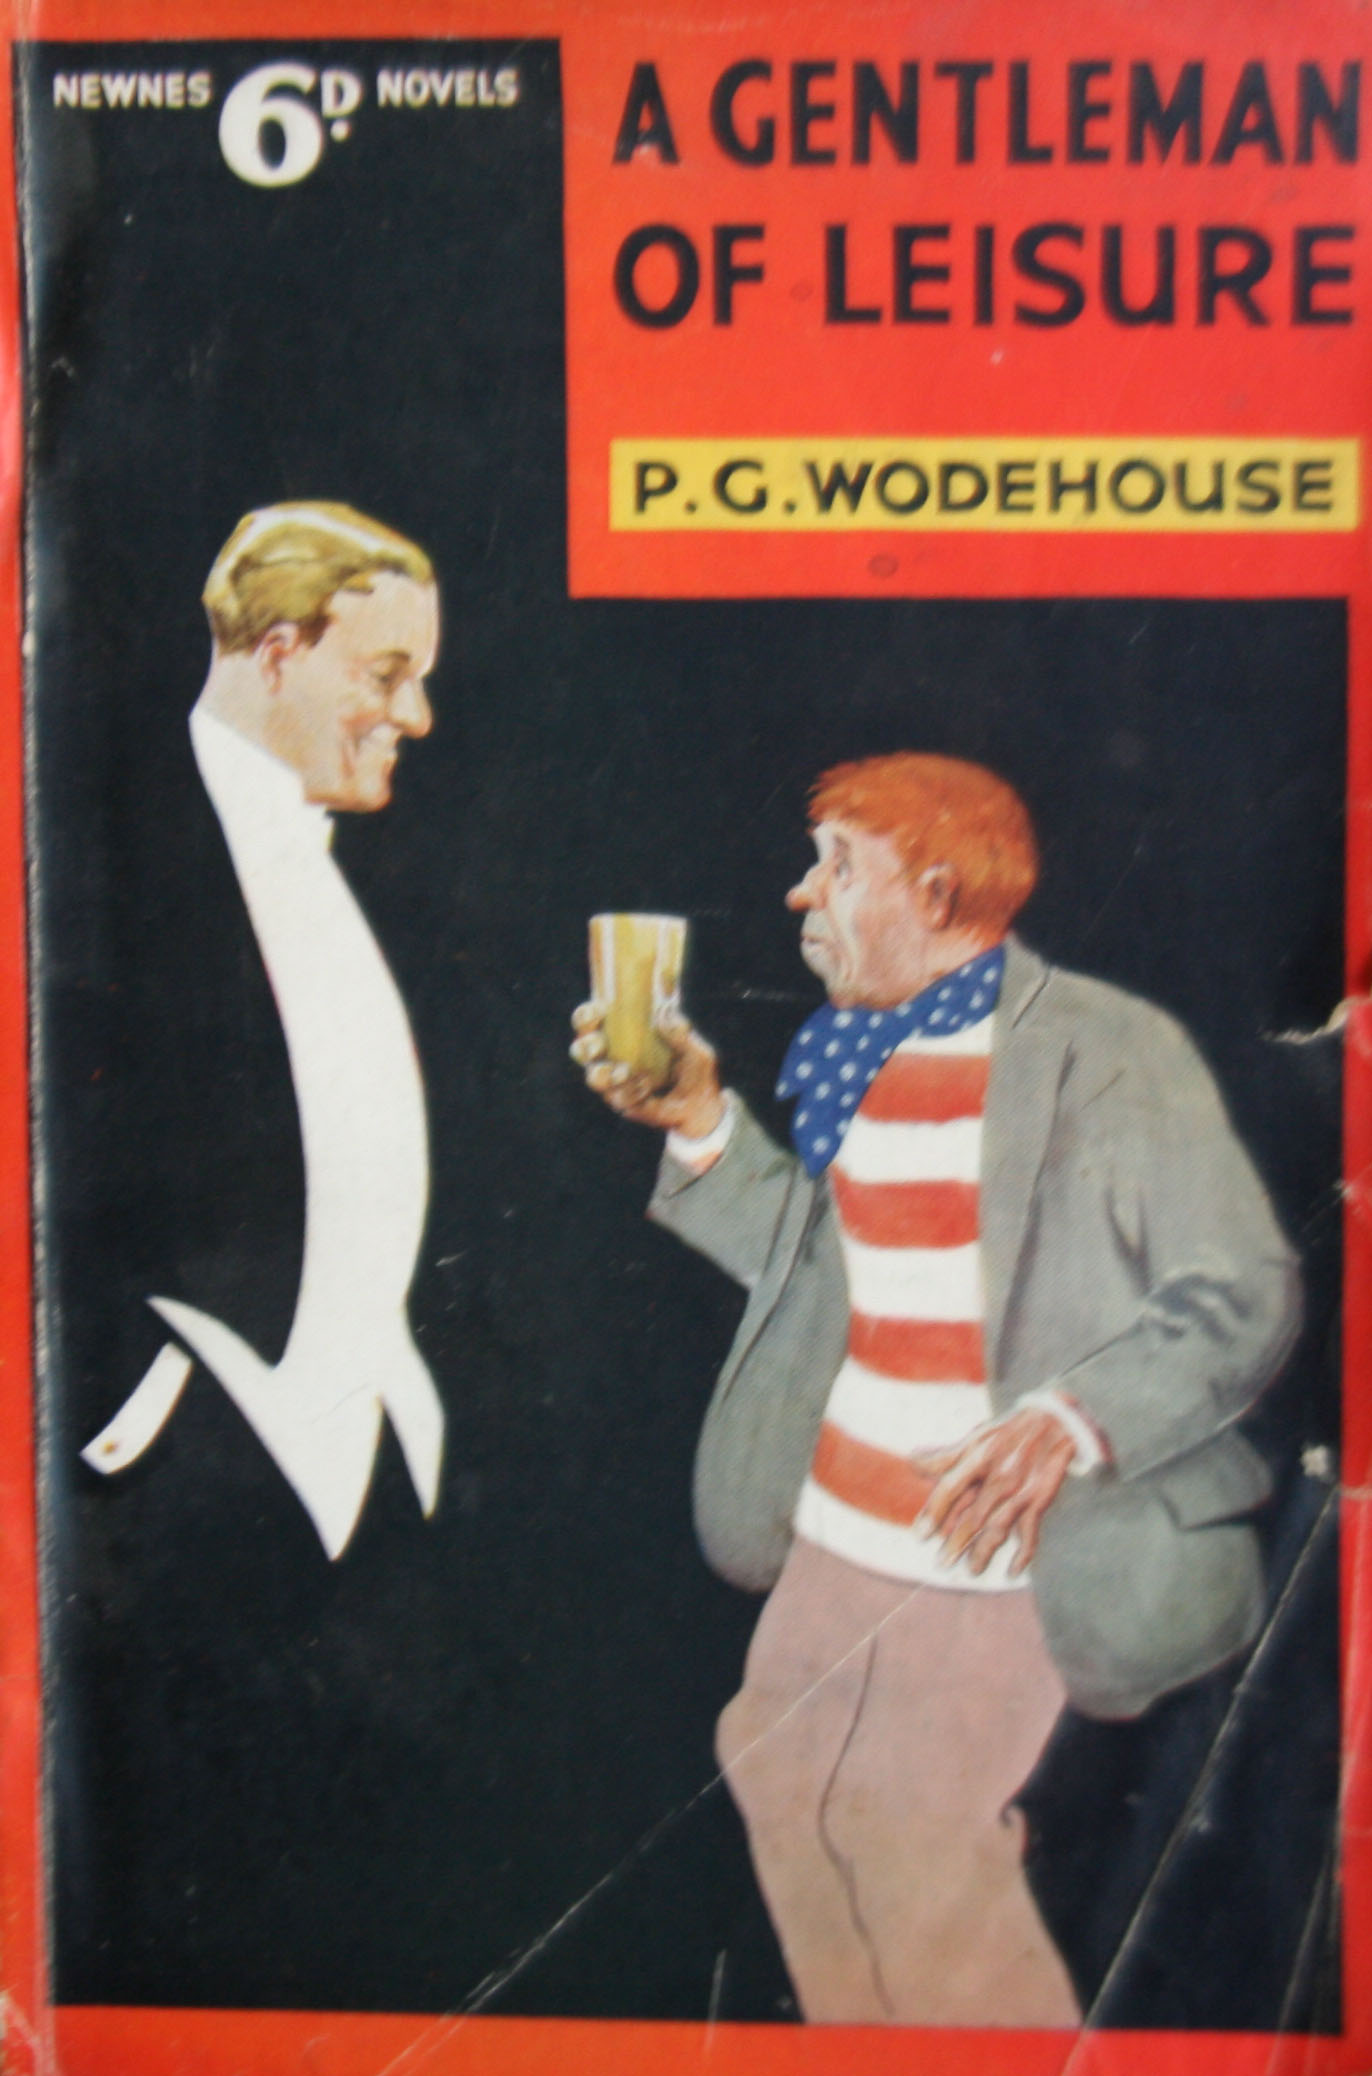 P G Wodehouse A Gentleman of leisure